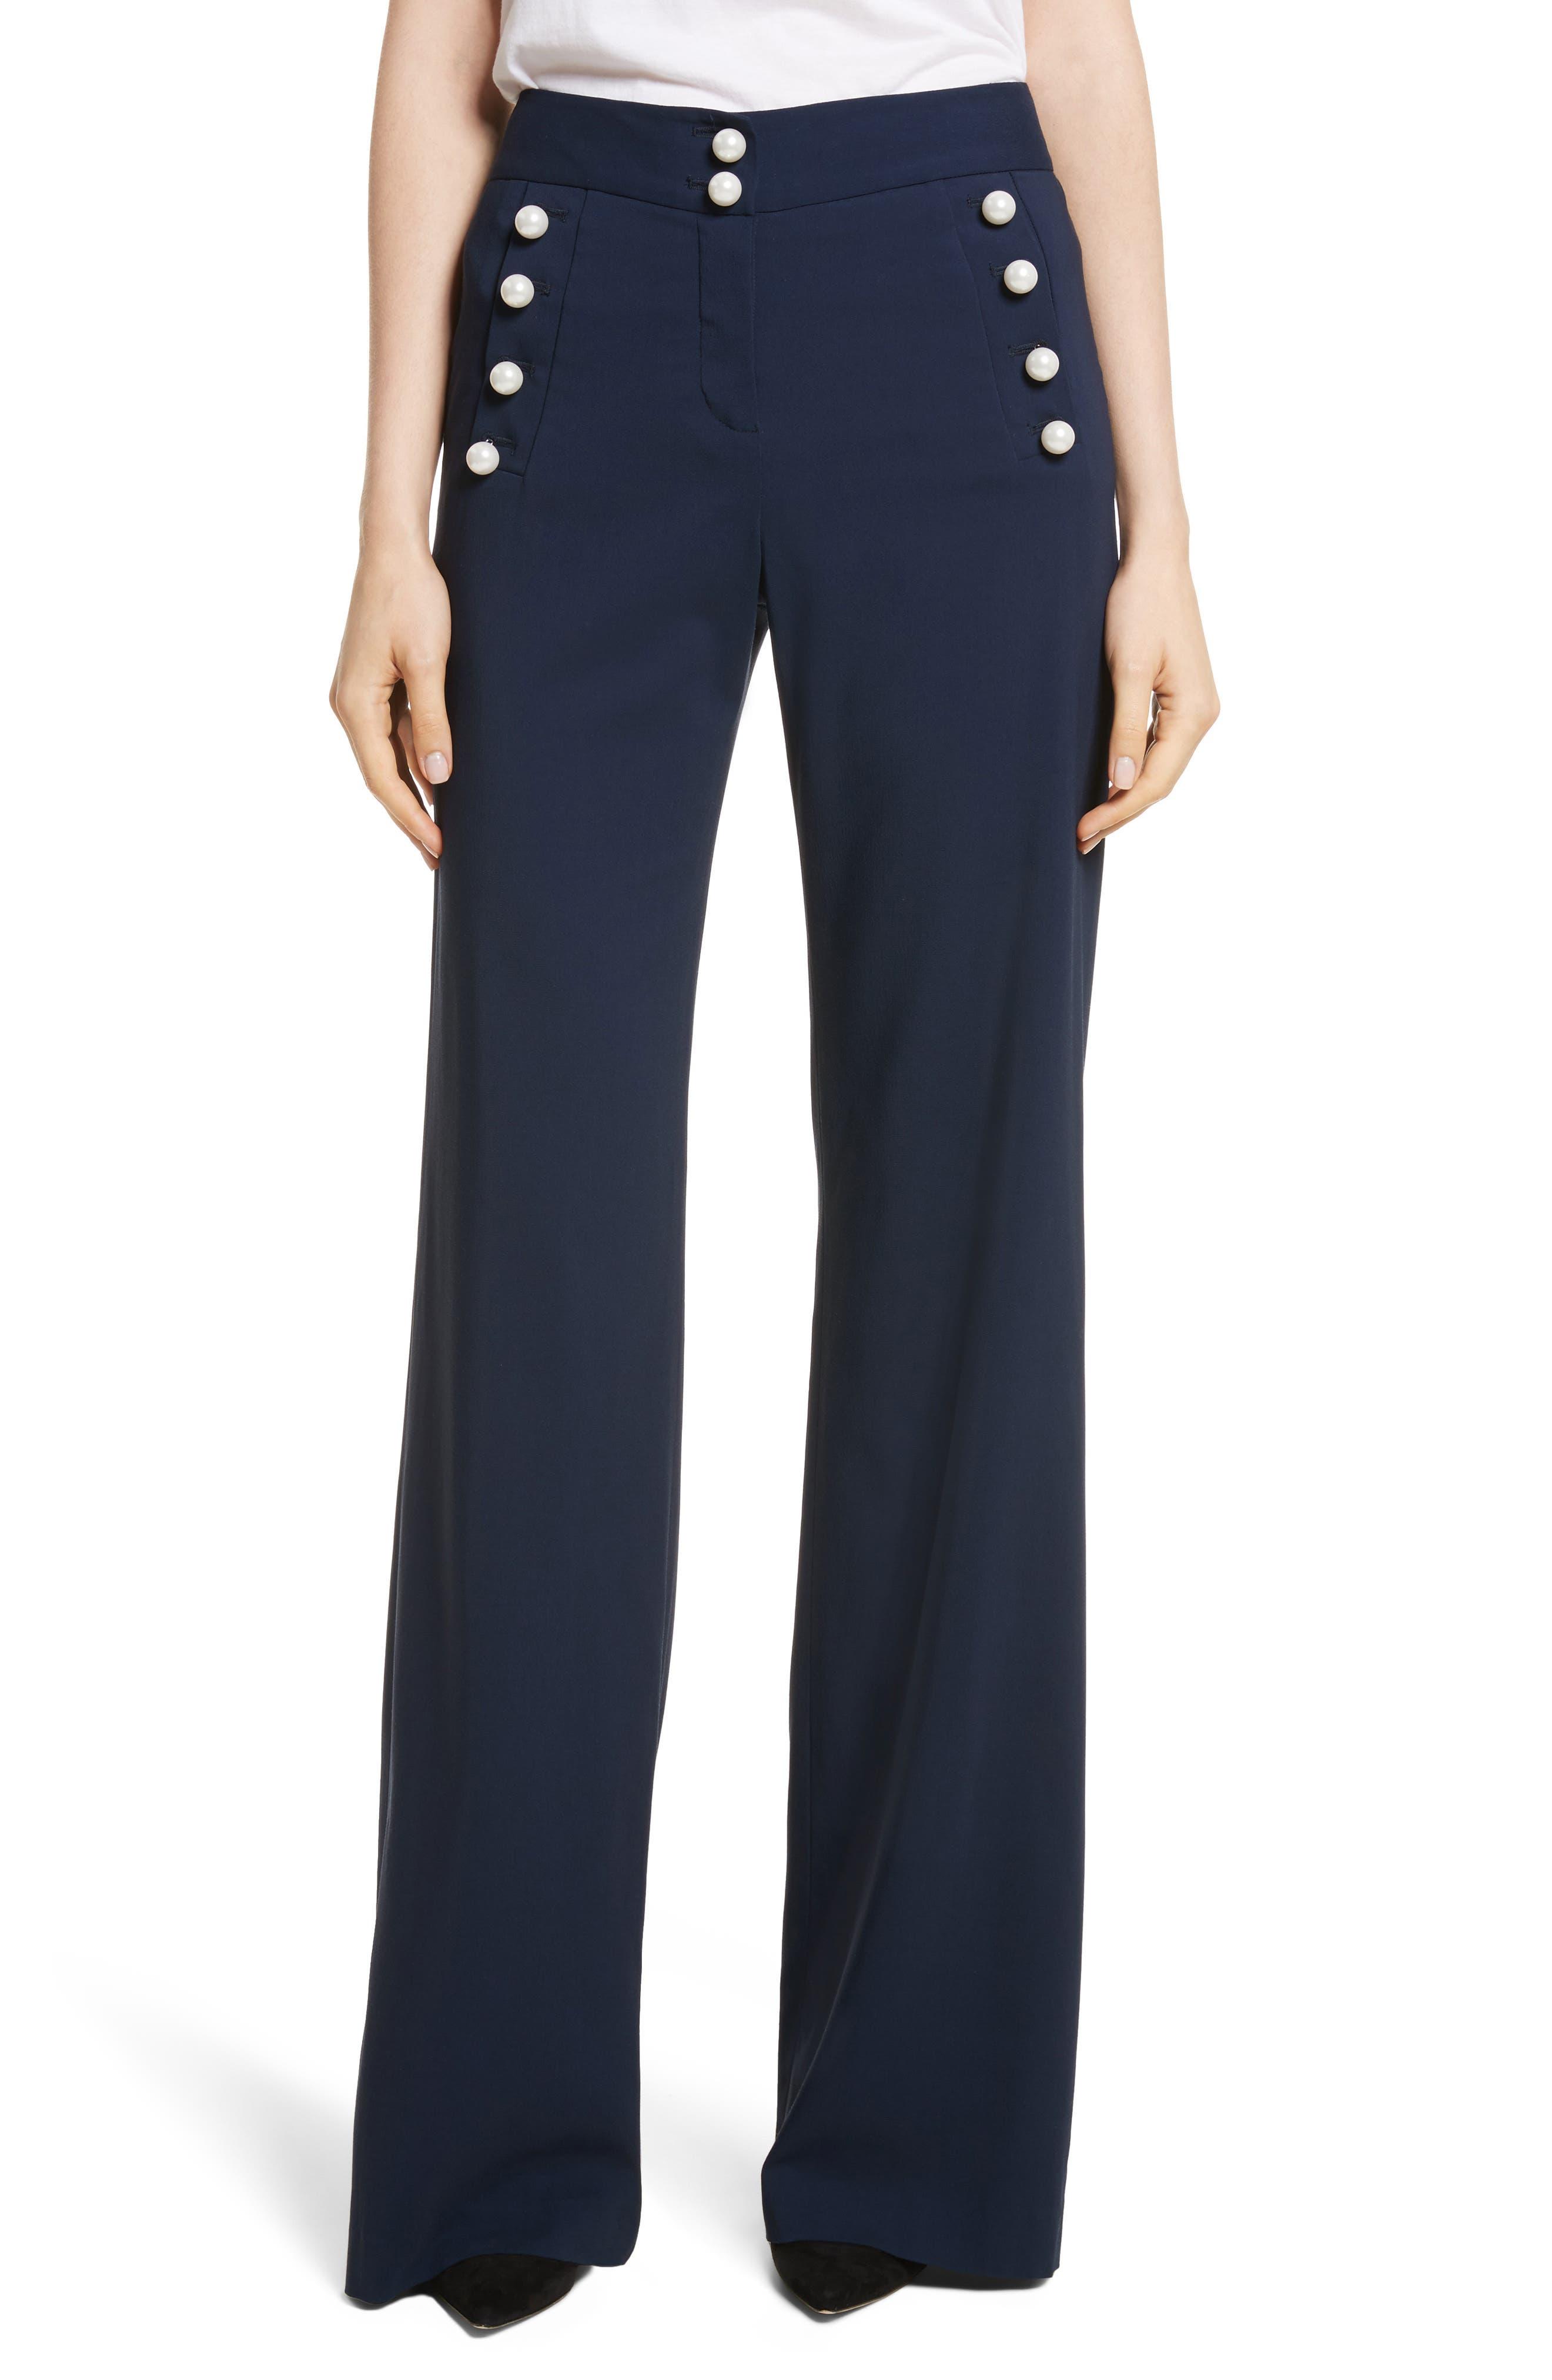 Adley Sailor Pants,                             Main thumbnail 1, color,                             410